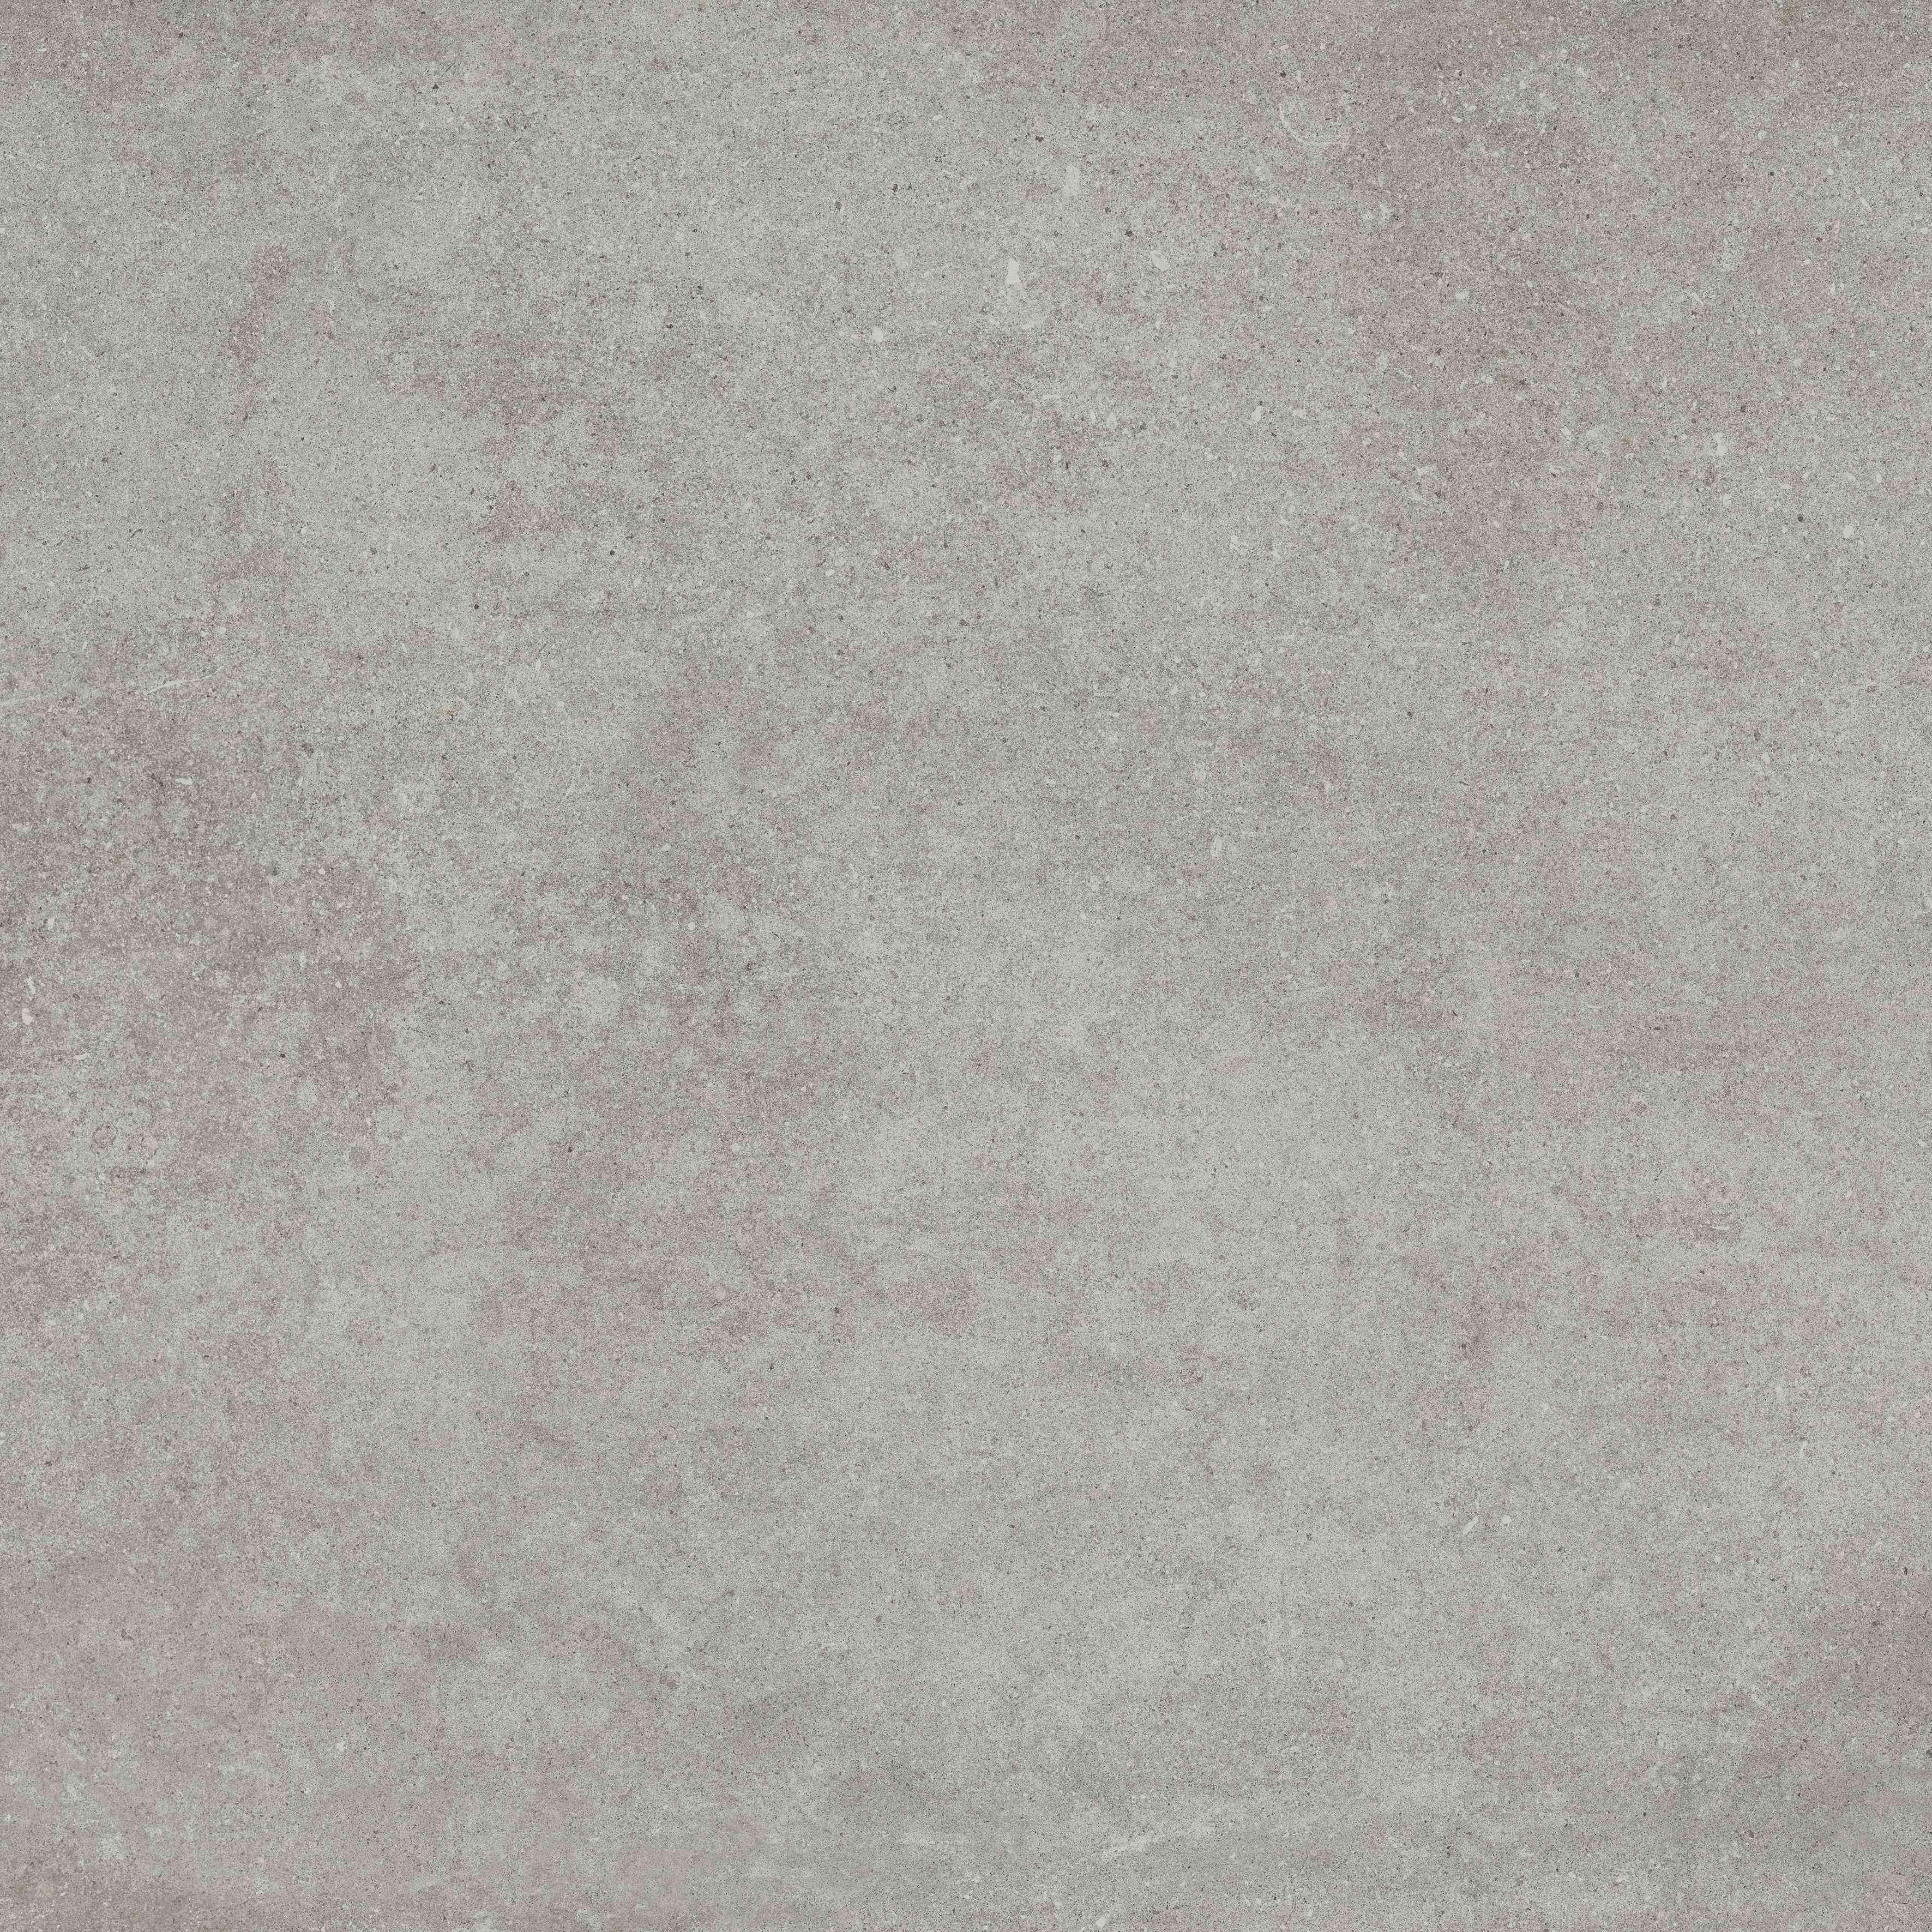 Плитка GRIGIO (ZRXRM8R) изображение 13